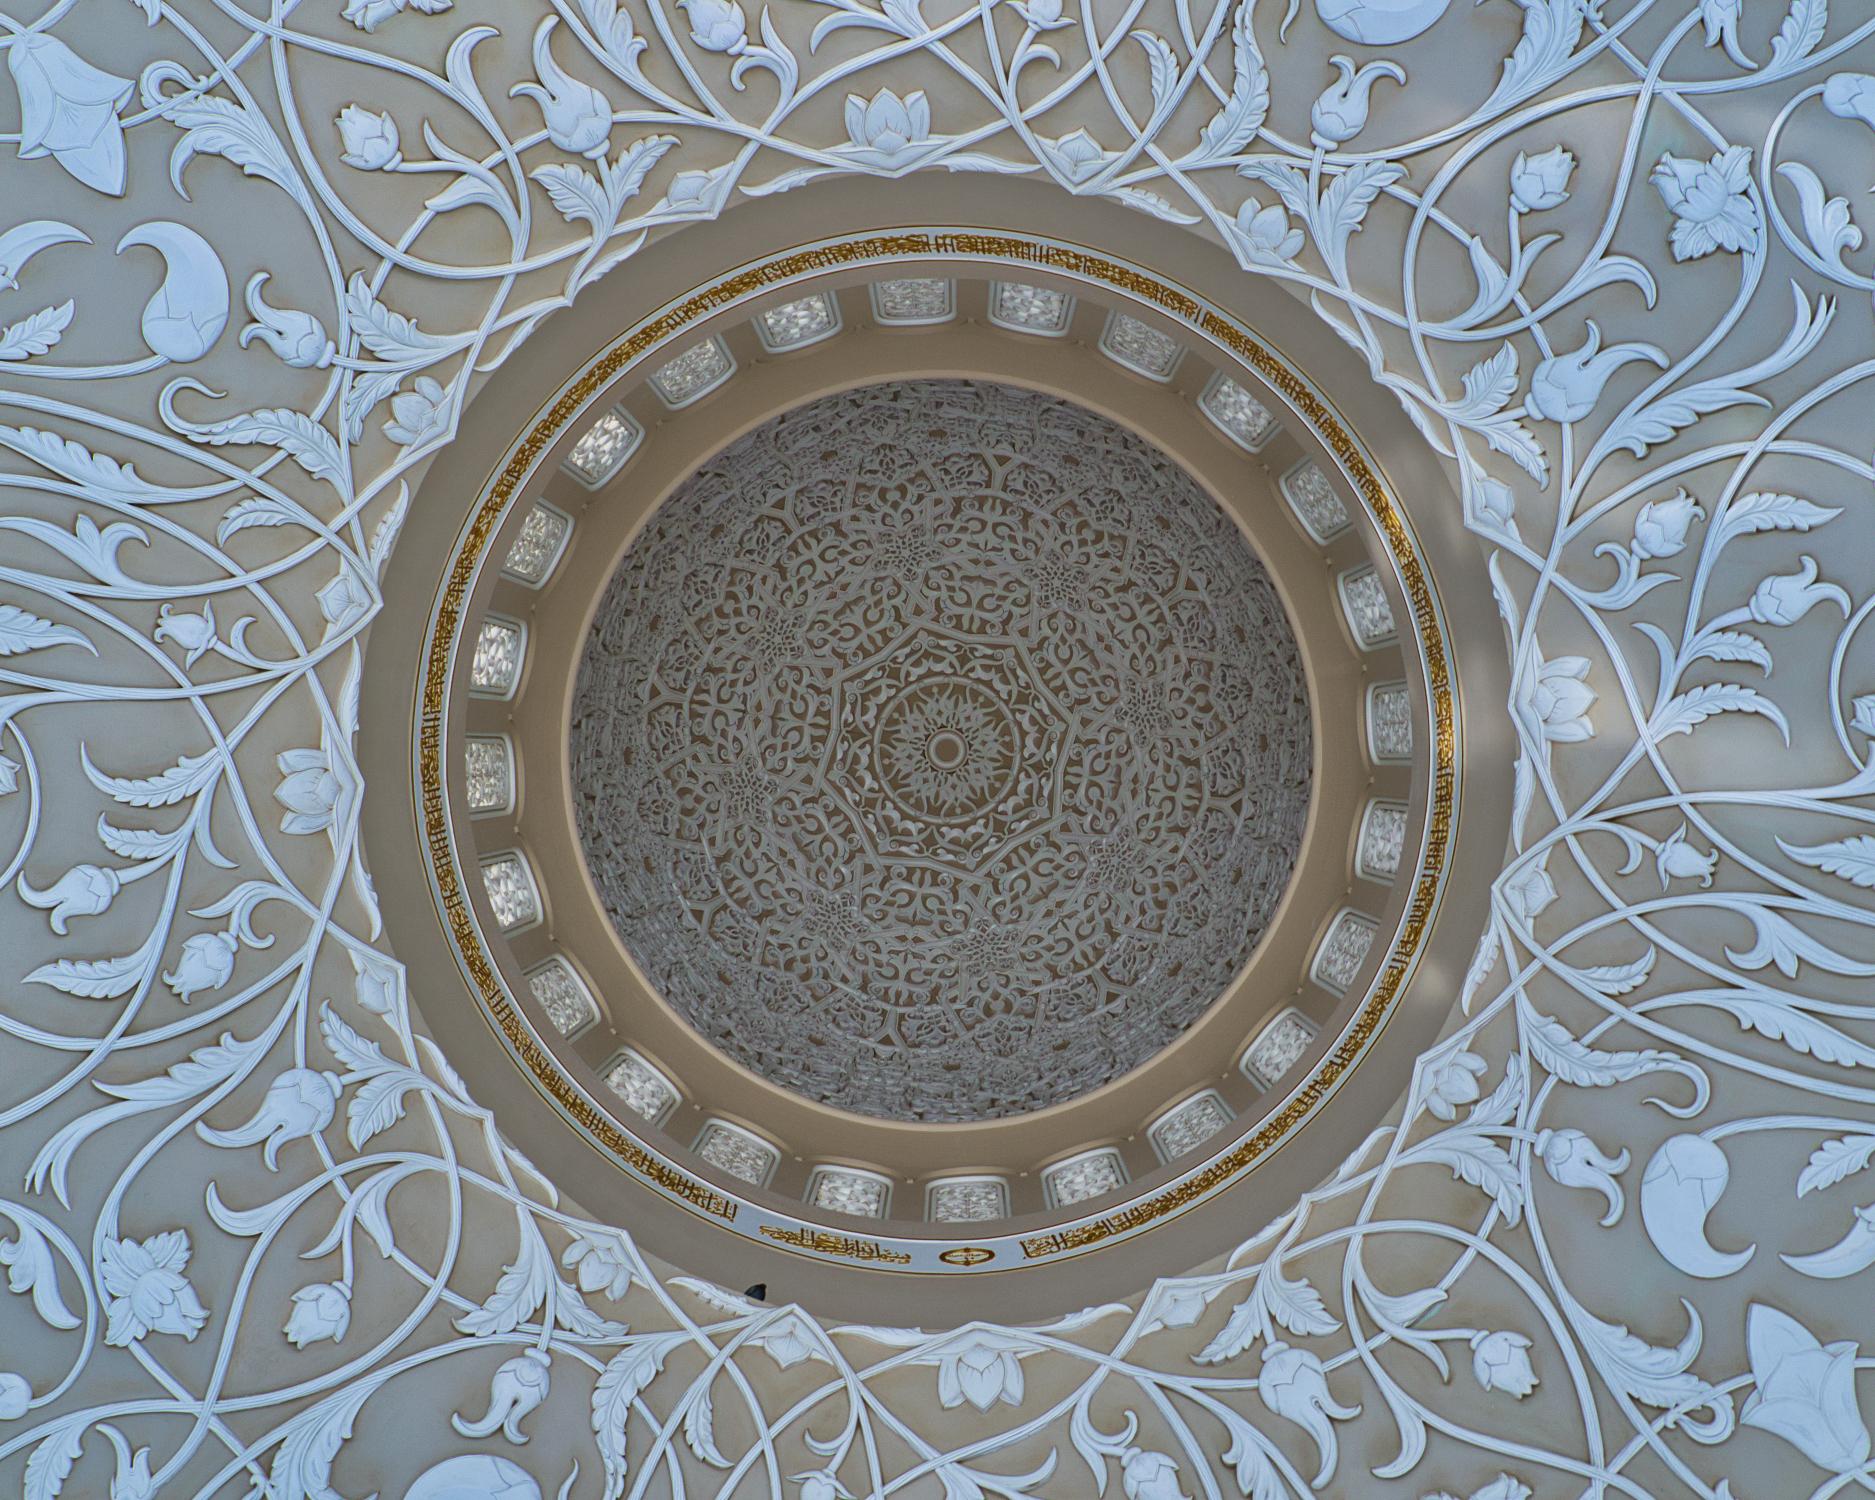 Moschea Abu Dhabi - interno cupola -1211.jpeg